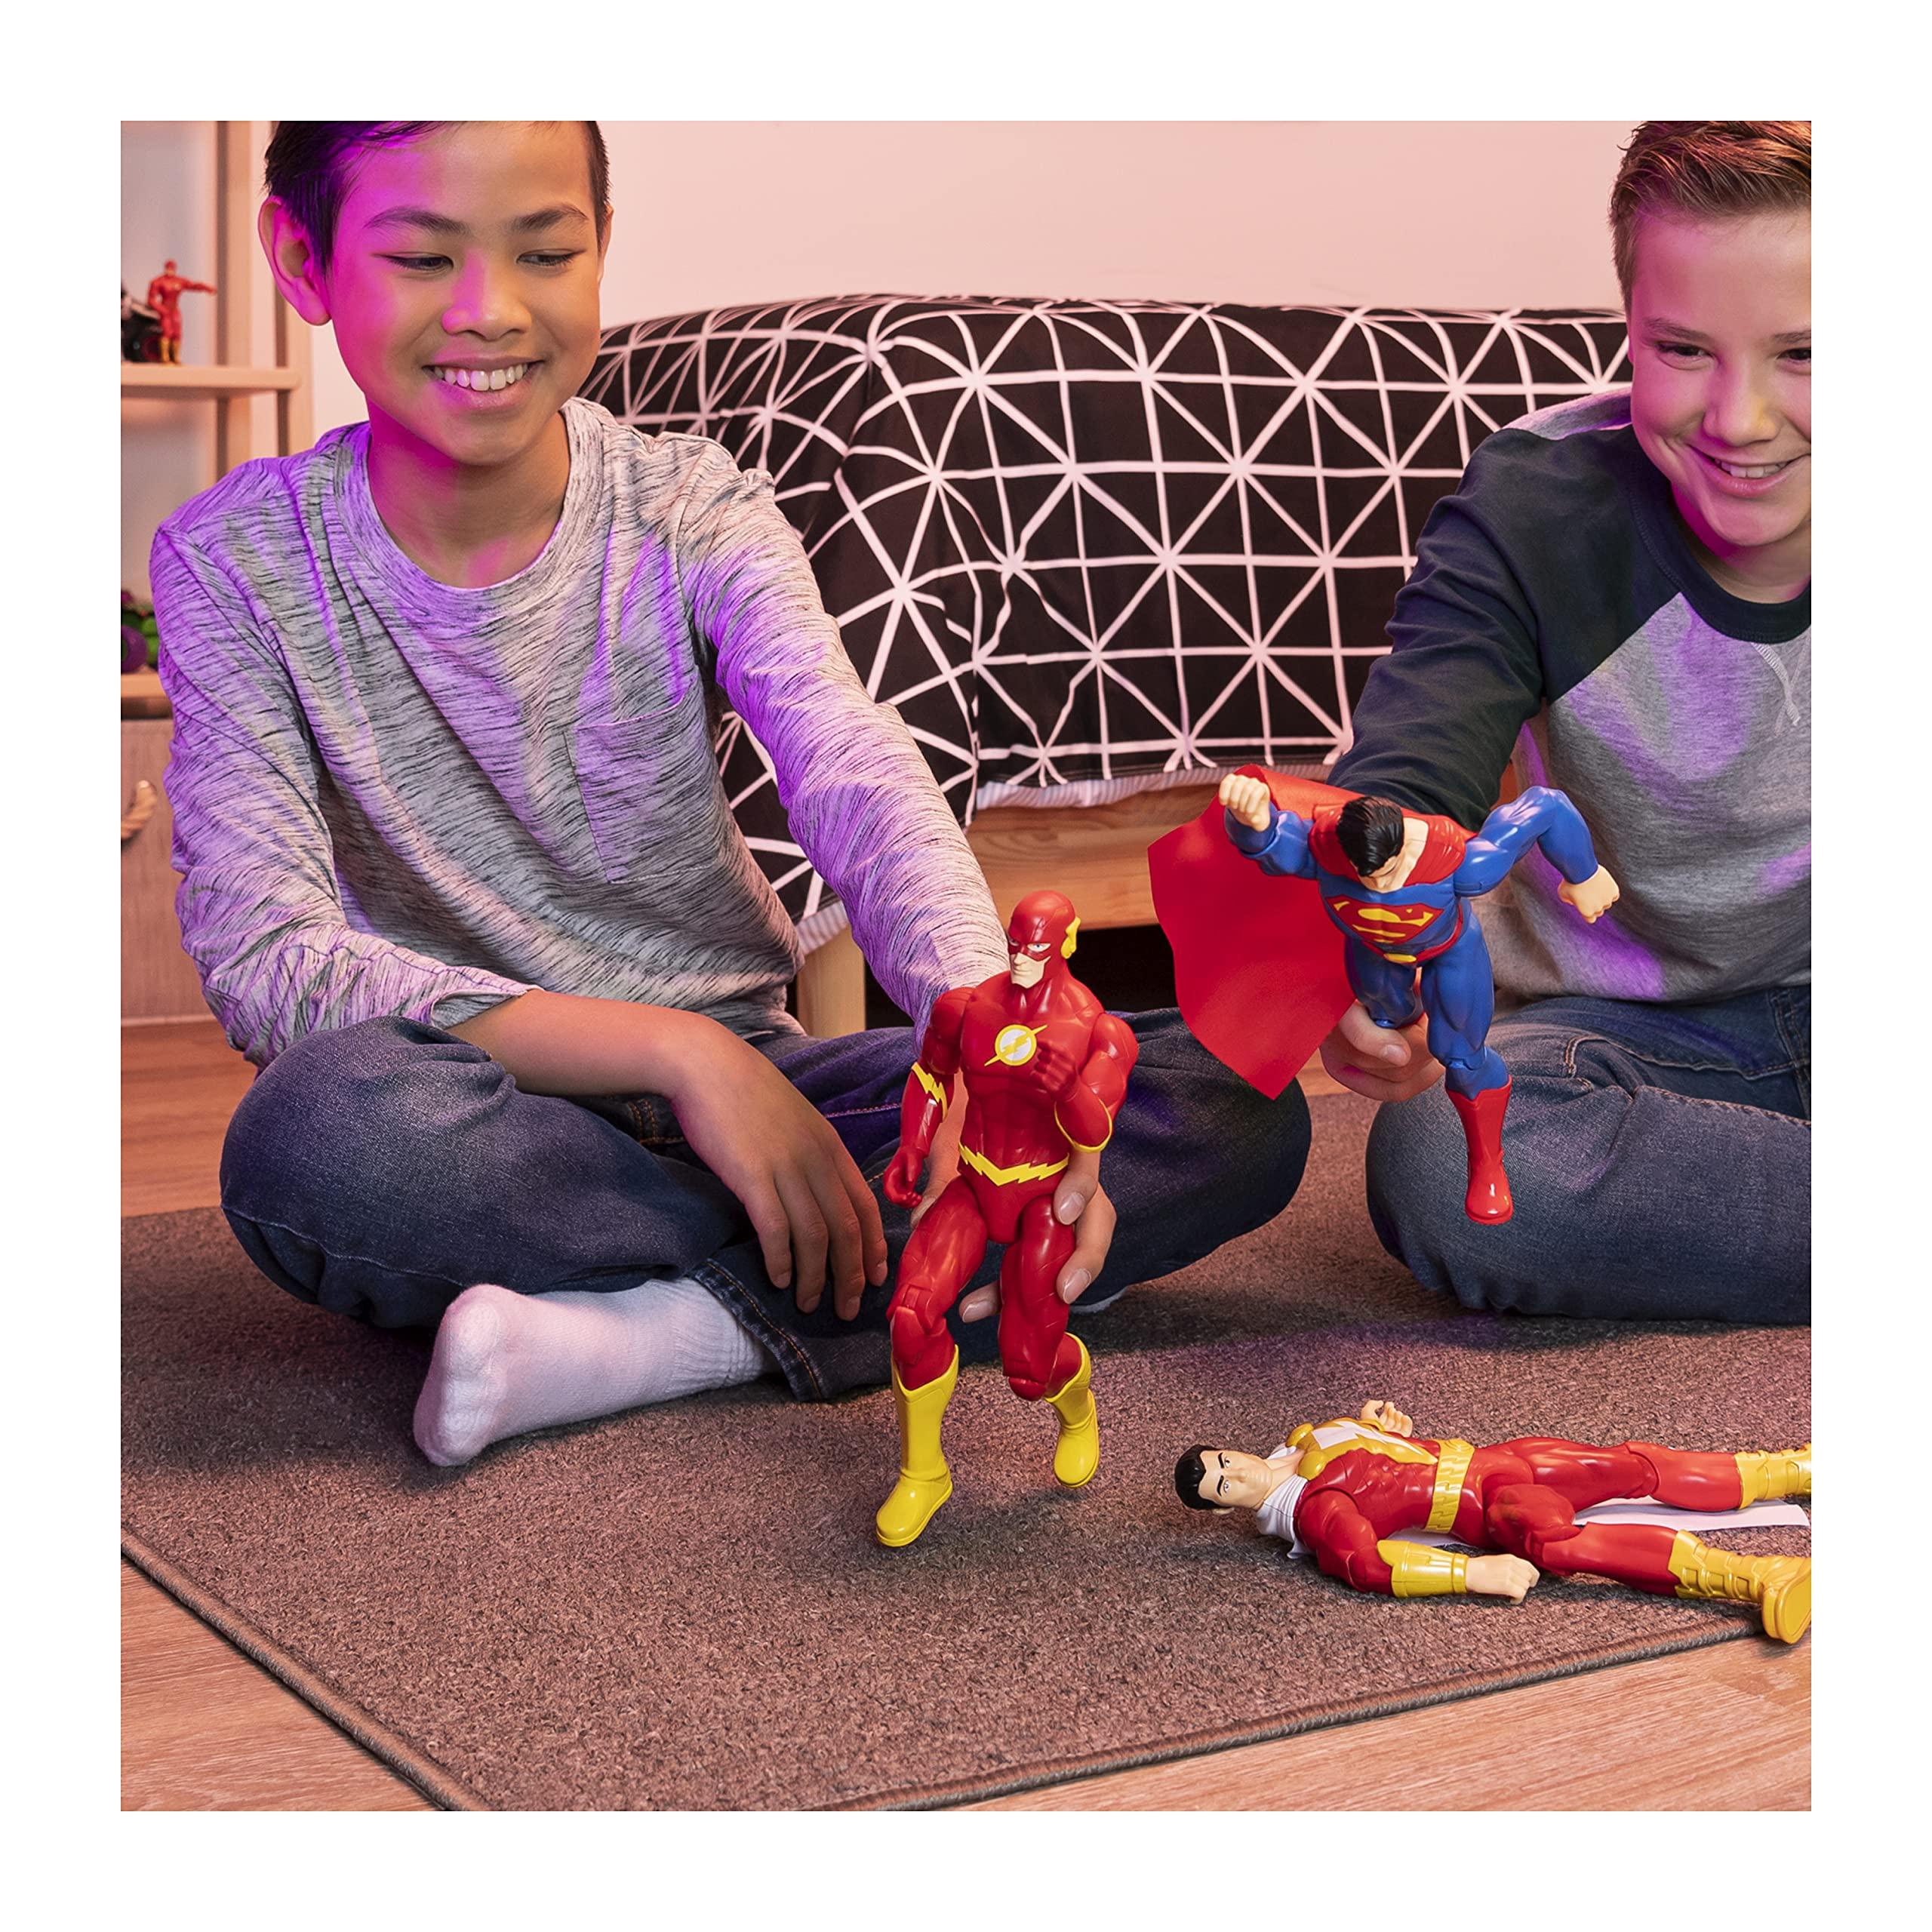 BATMAN DC Comics, 12-Inch THE FLASH Action Figure, Kids Toys for Boys Grey